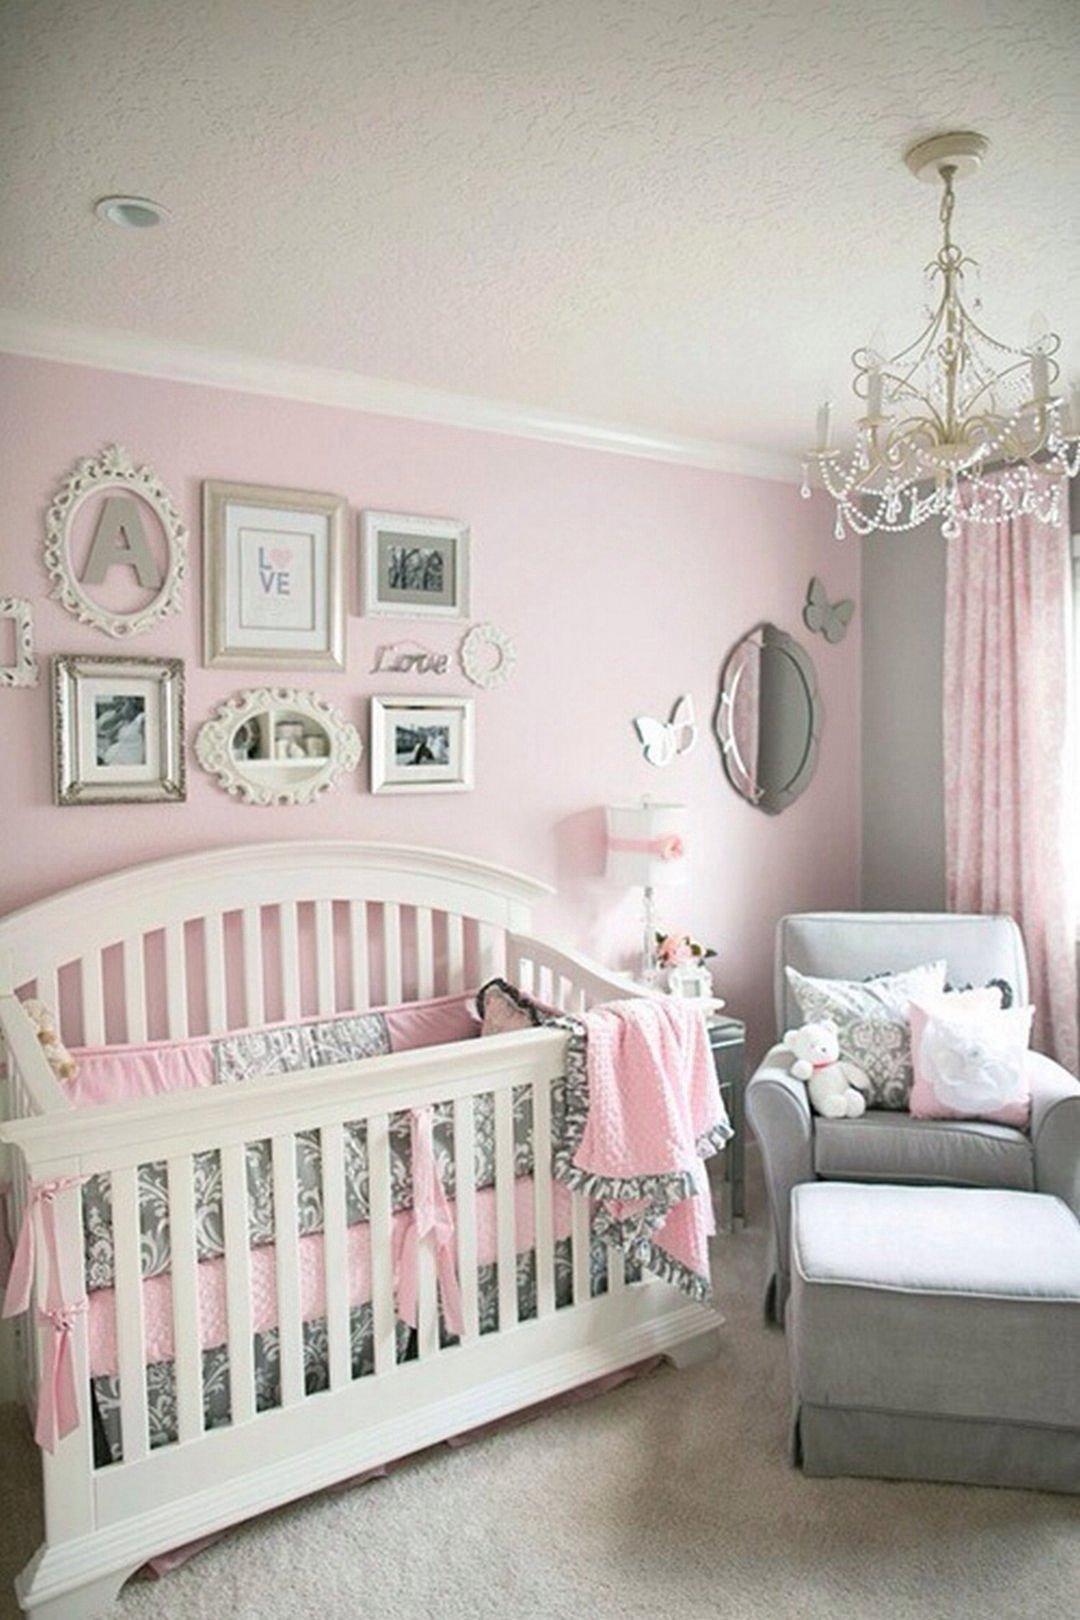 10 Wonderful Baby Girl Nursery Decorating Ideas 6 actionable tips on baby girl nursery nursery babies and girls 4 2020